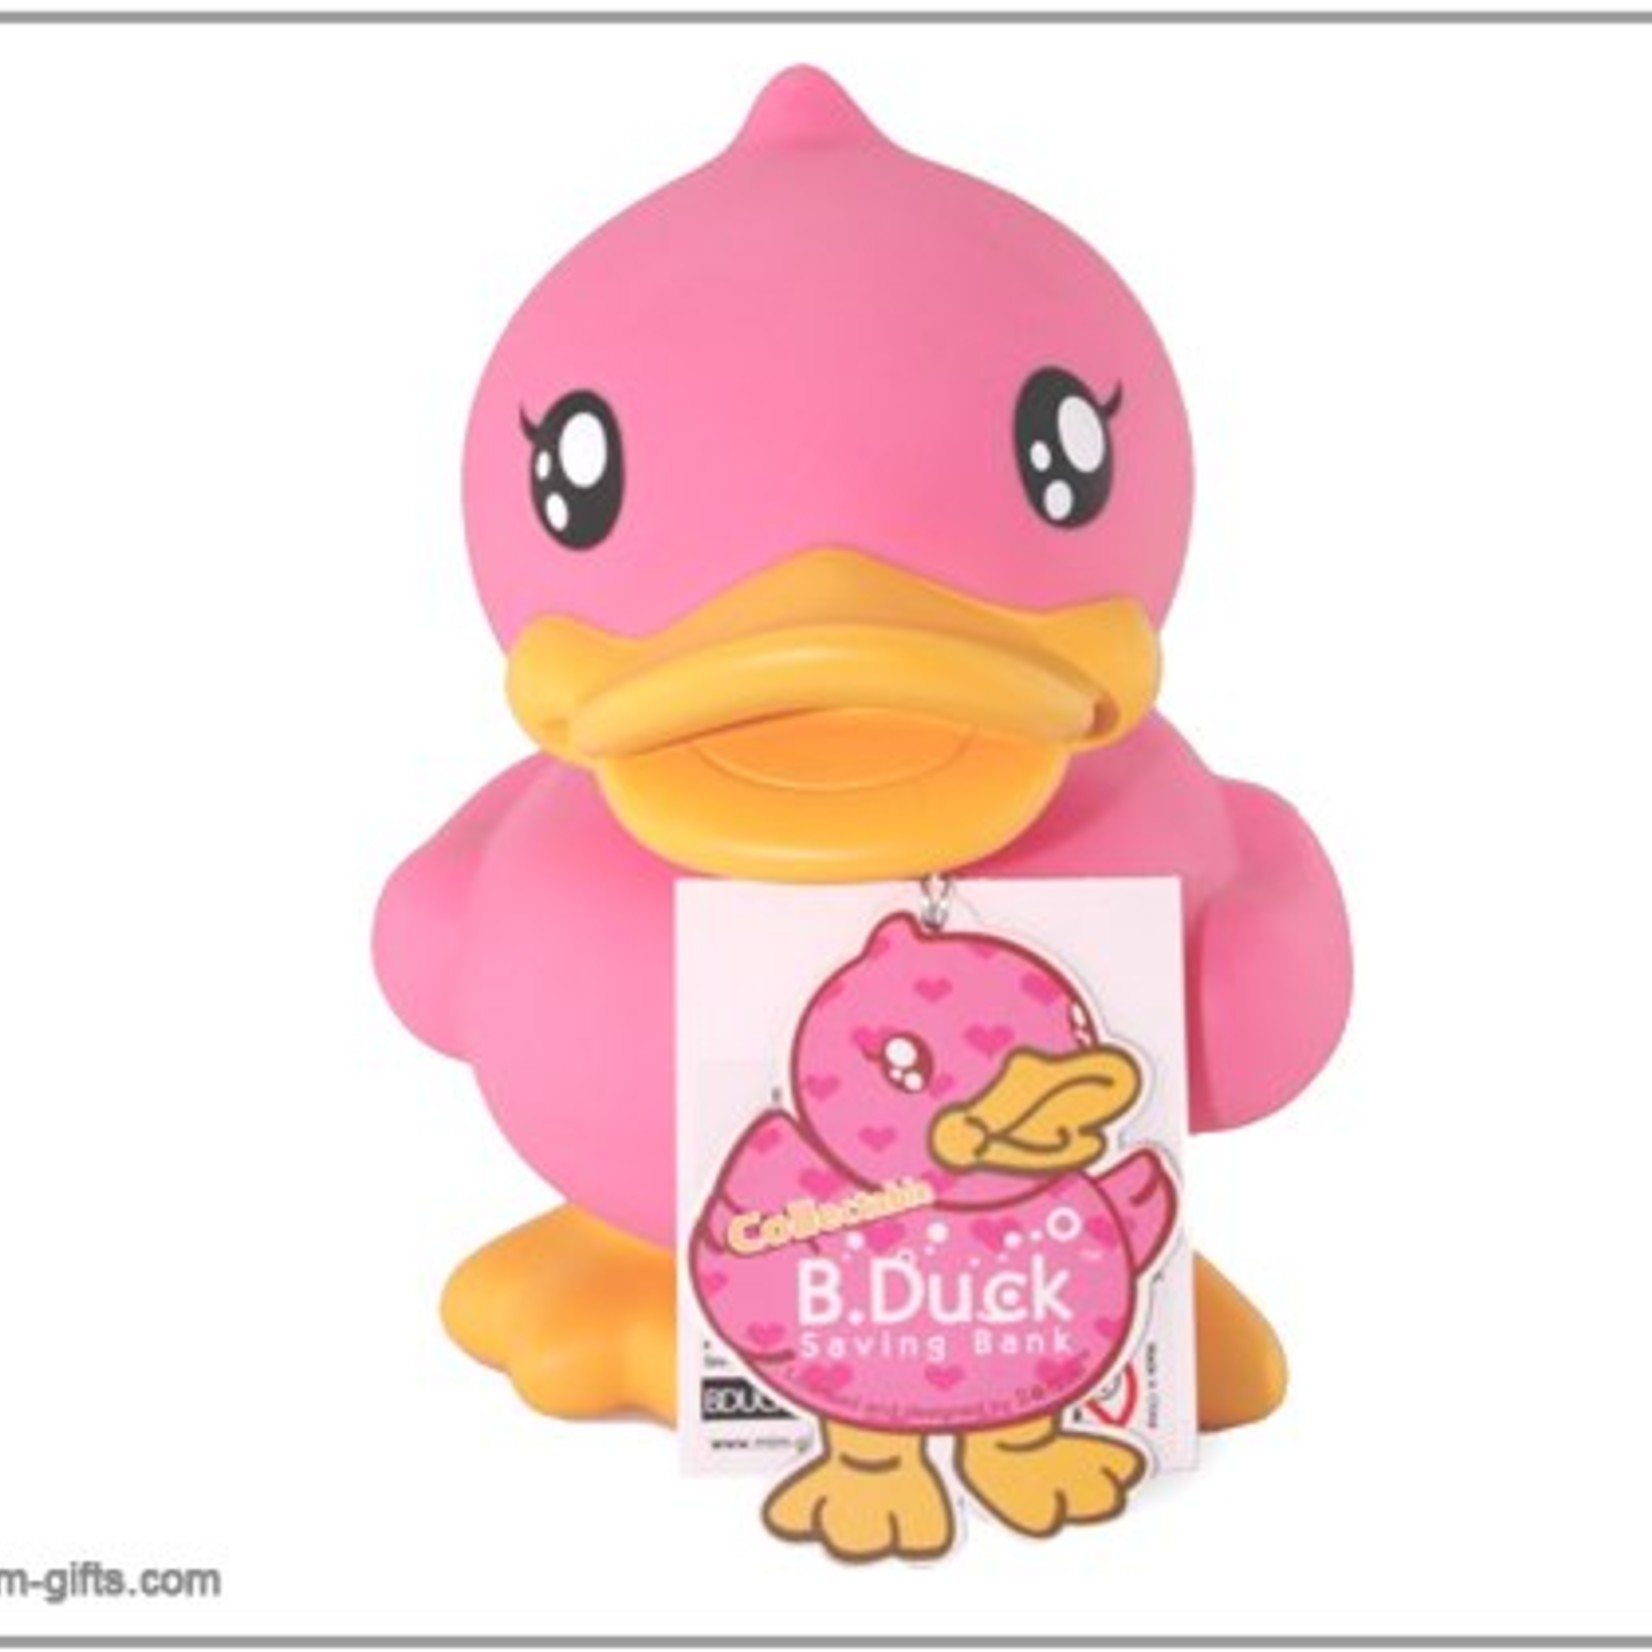 Bduck spaarpot roze Limited Edition. Formaat 18cm.